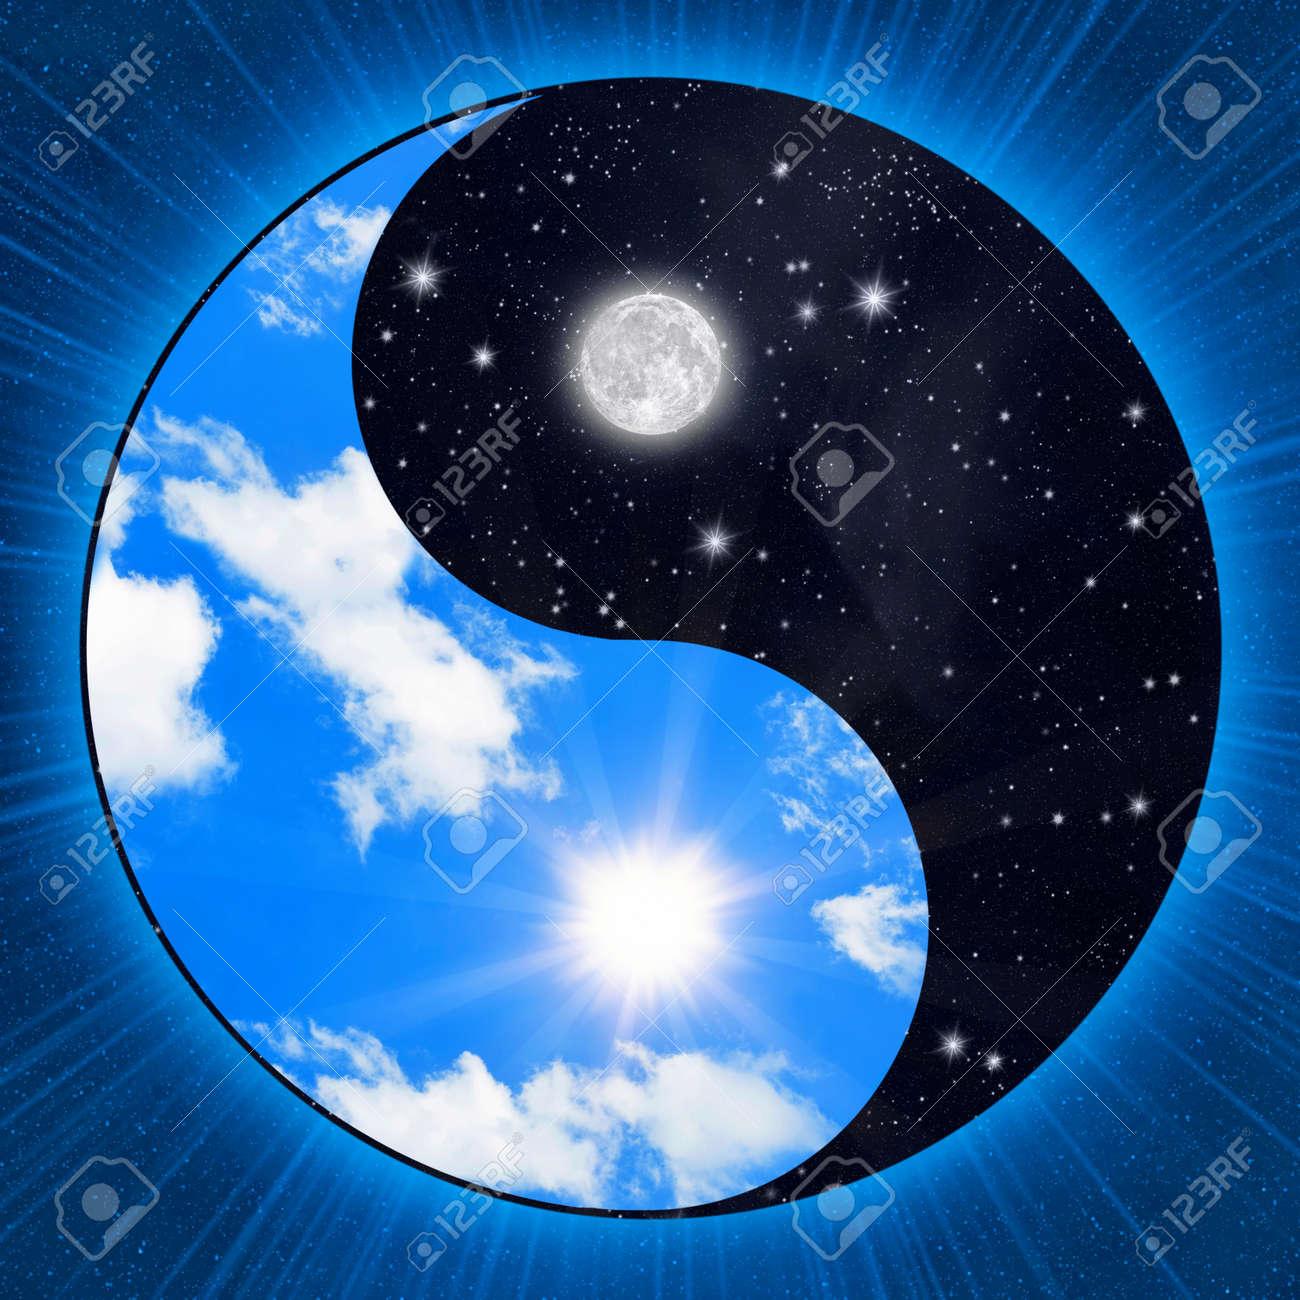 Yin yang symbol wigh clouds and stars stock photo picture and yin yang symbol wigh clouds and stars stock photo 12332713 biocorpaavc